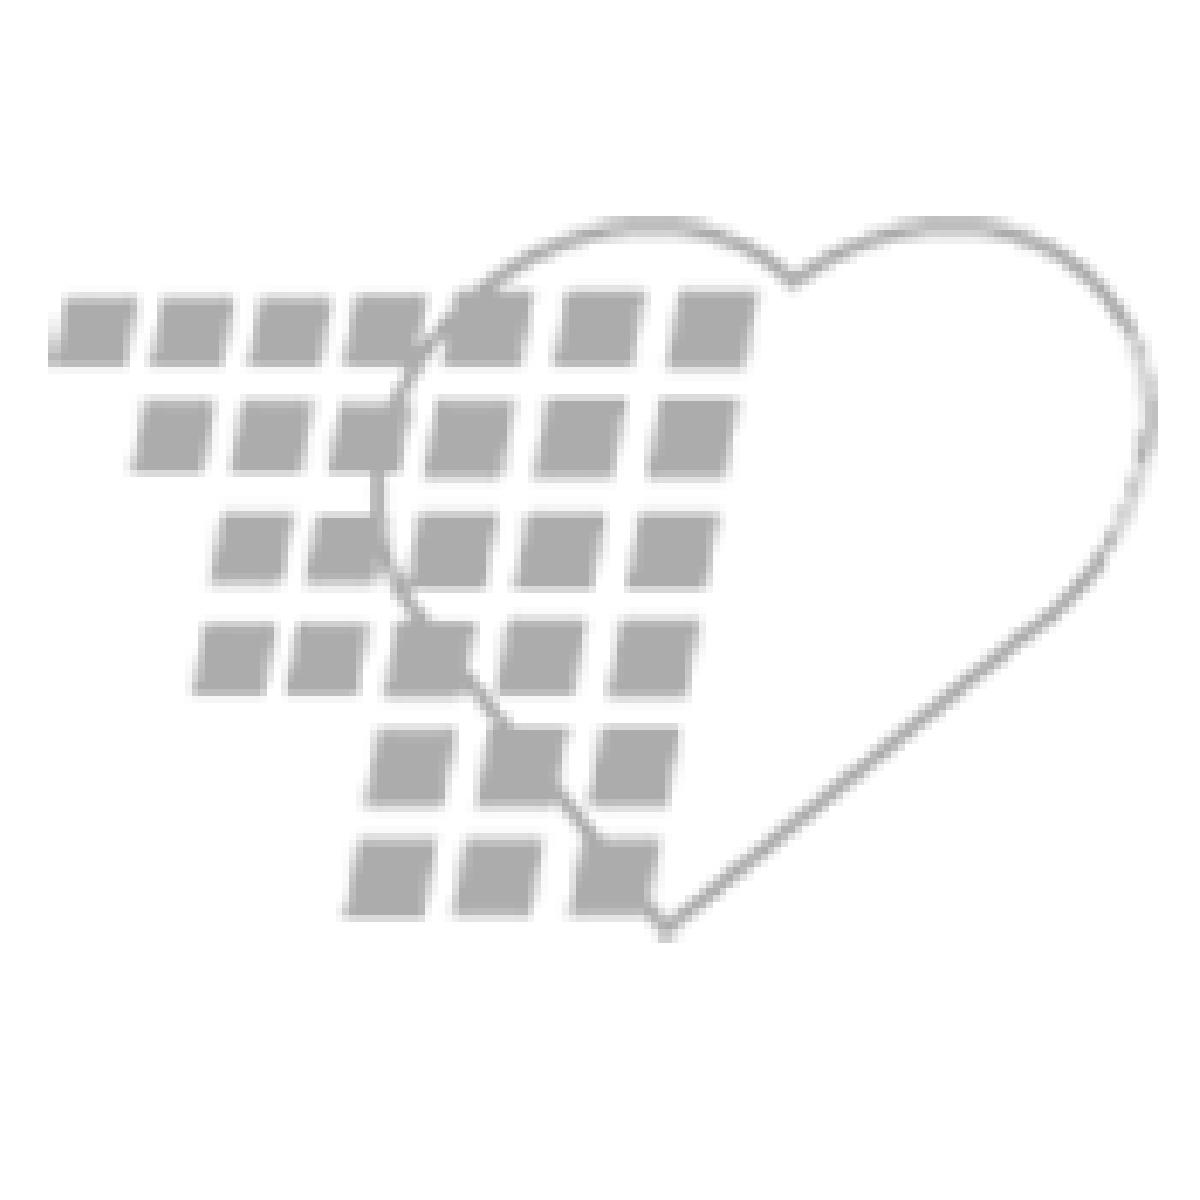 05-76-0636-PED - Pro-Slide   Pediatric Patient Transfer Board 72 x 18 x 3/16 Inch